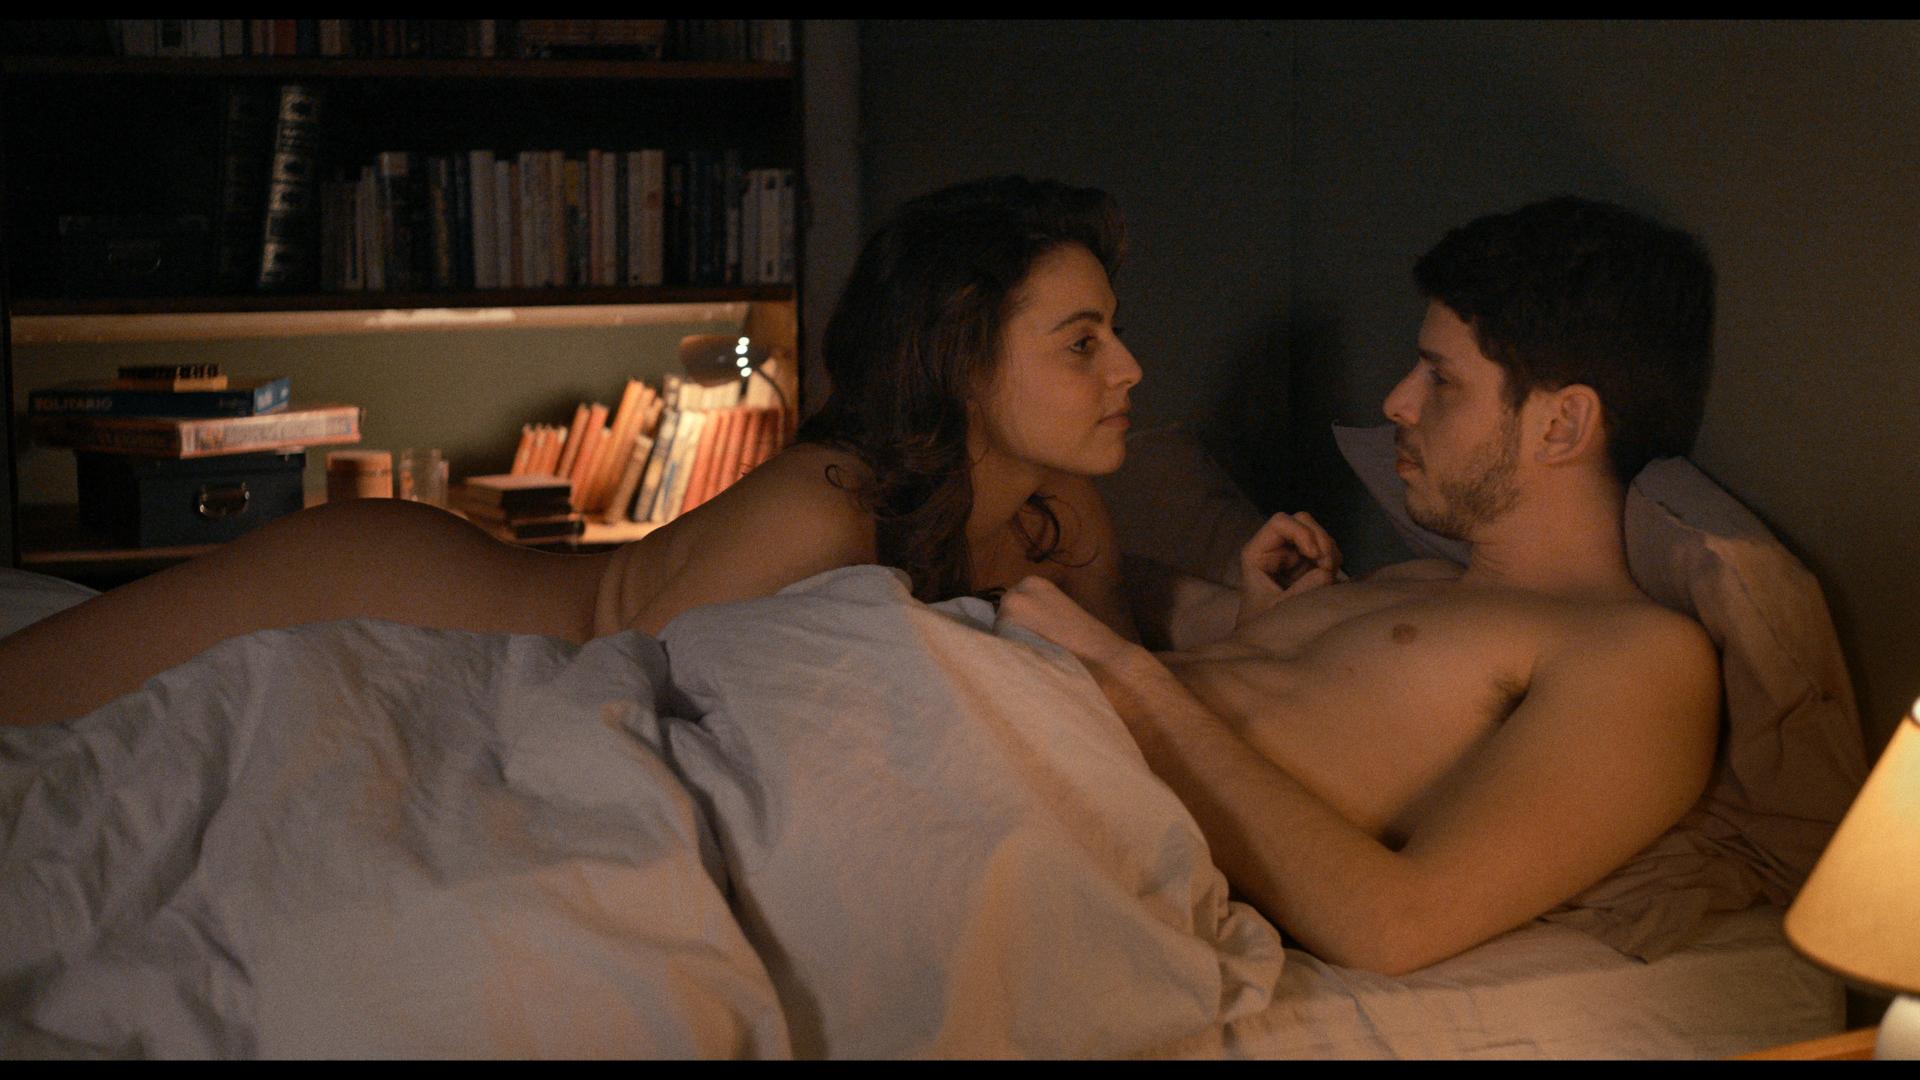 THE NIGHT BELONGS TO LOVERS